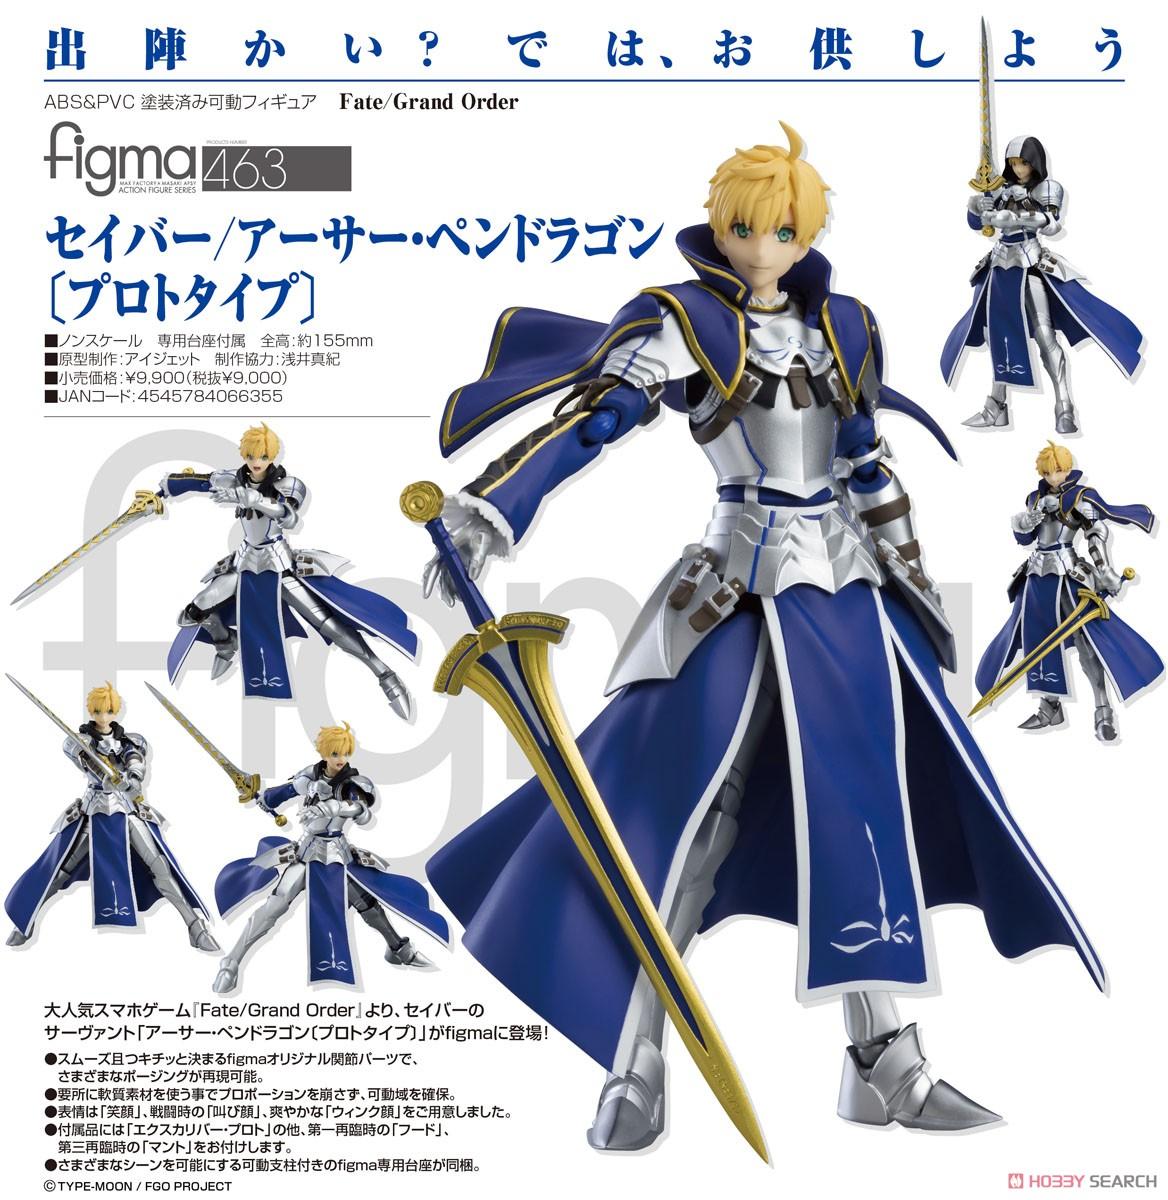 Fate/Grand Order figma Saber/Arthur Pendragon (Prototype)